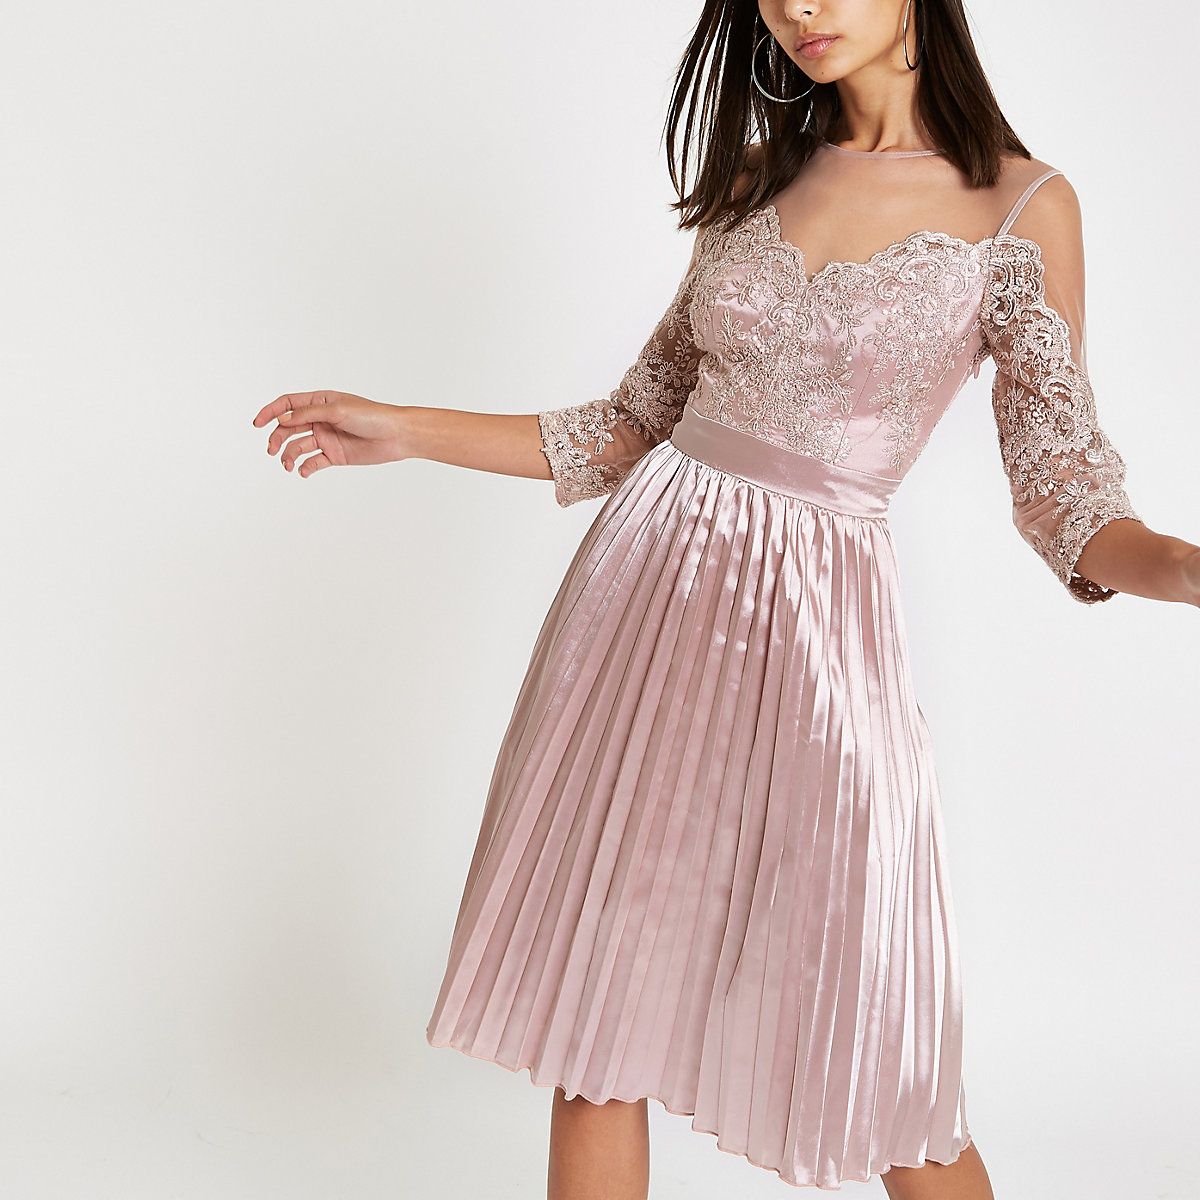 Chi Chi London pink lace mesh flare dress